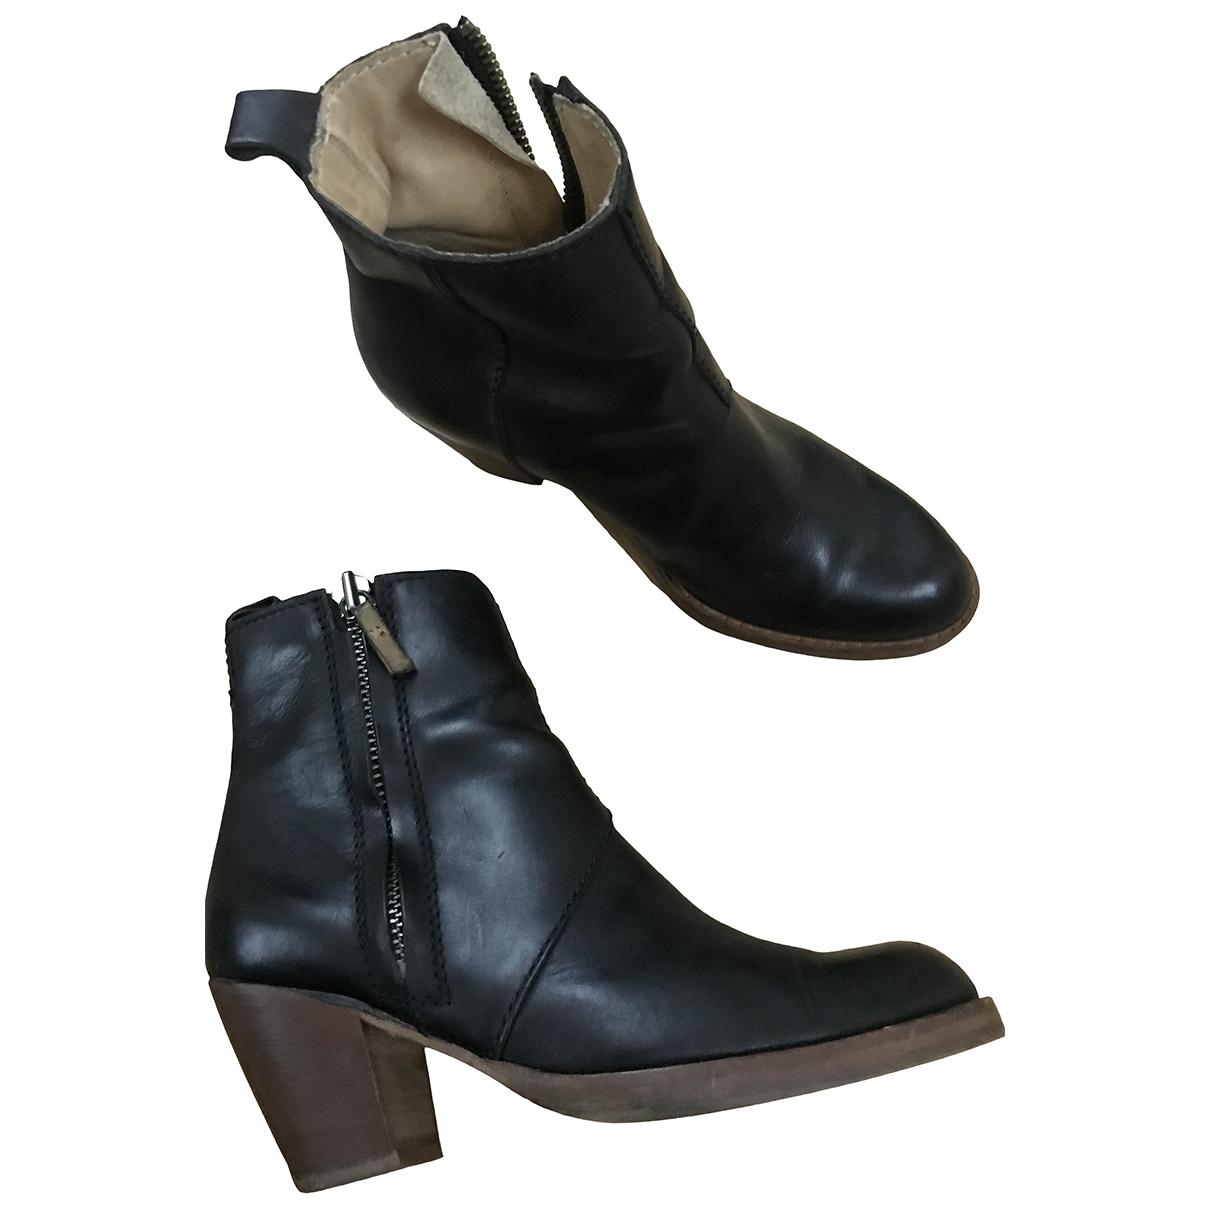 Acne Studios Pistol Black Leather Ankle boots for Women 38 EU